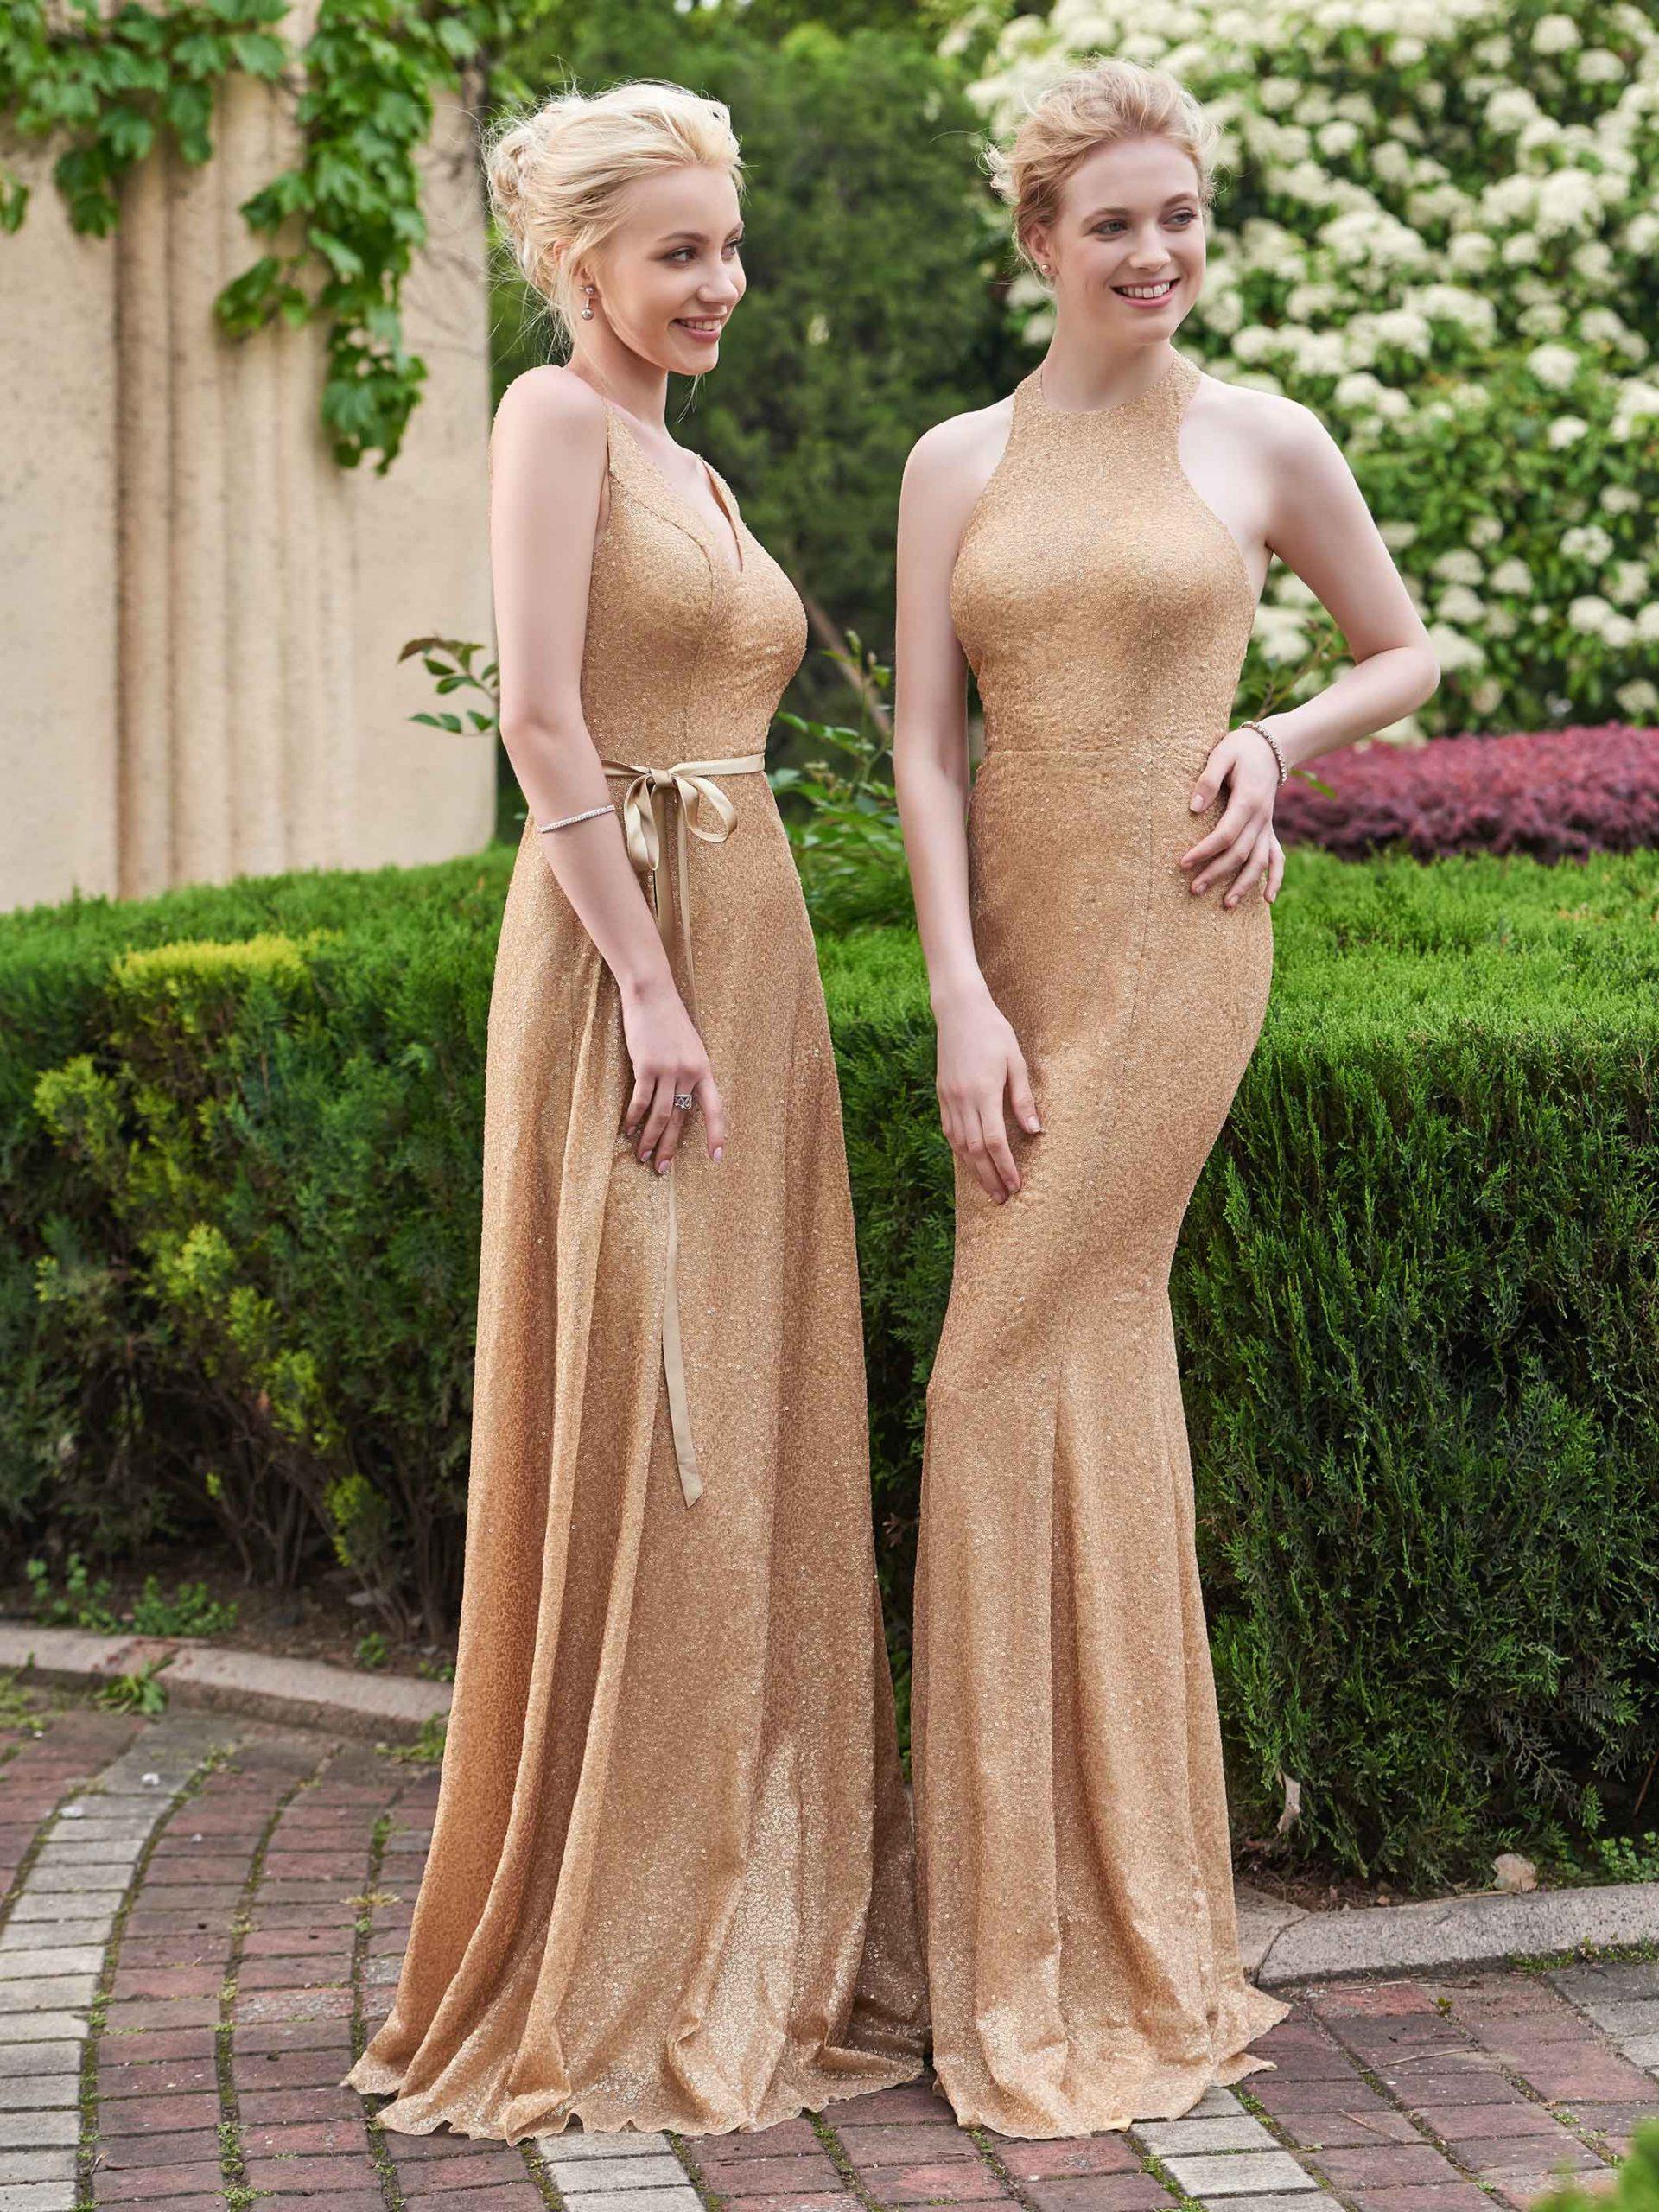 Schlinge Kragen Sleeveless Bodenlang Pailletten Hochzeit